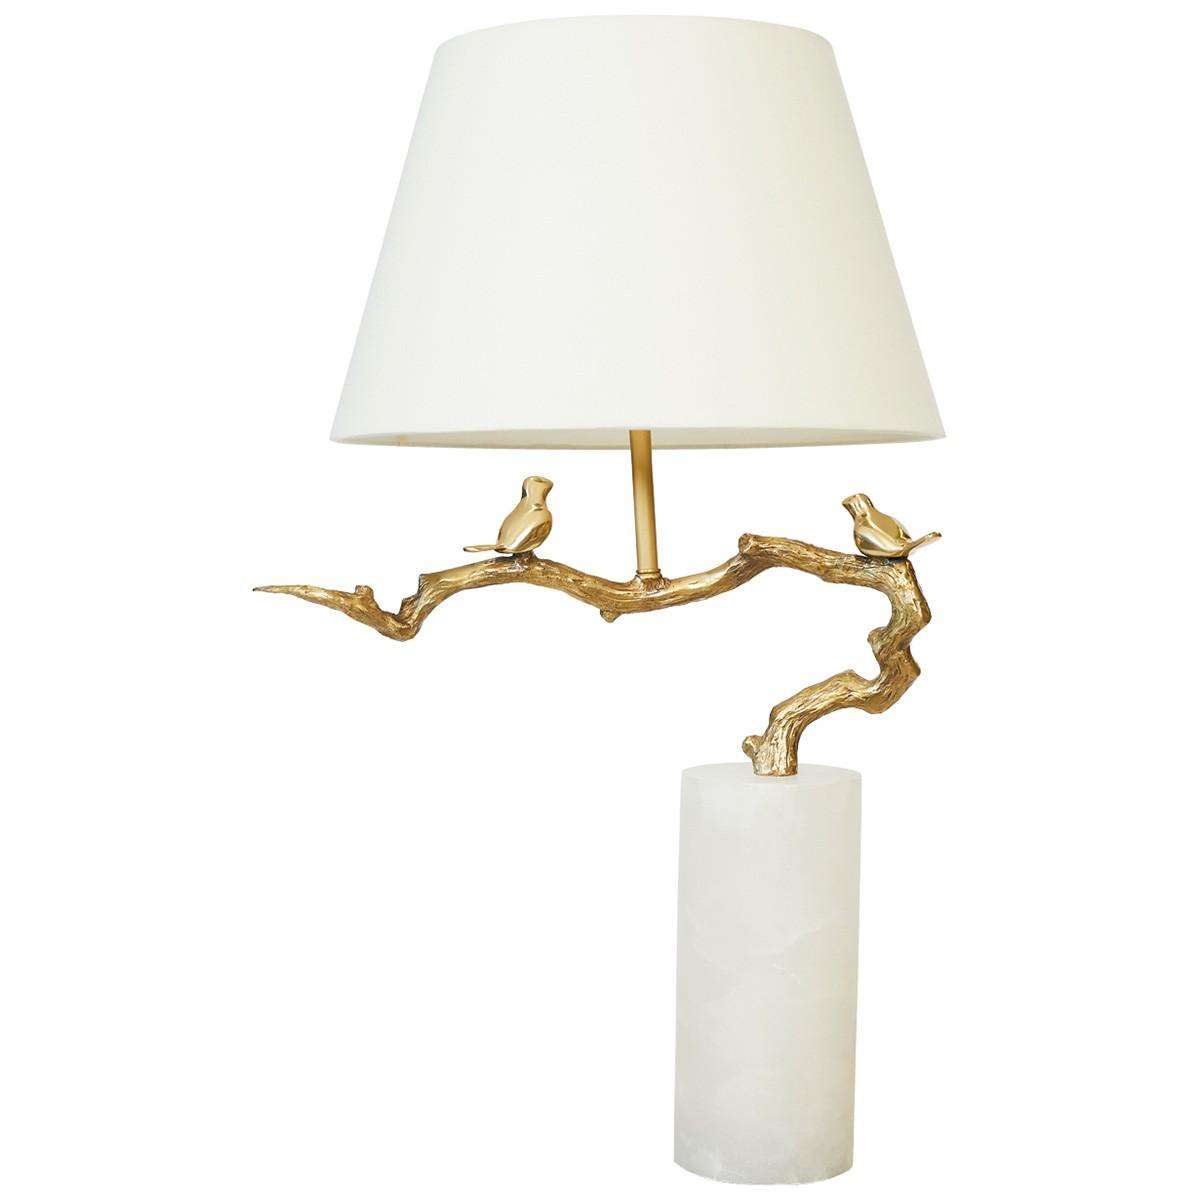 Seance Marble Base Table Lamp